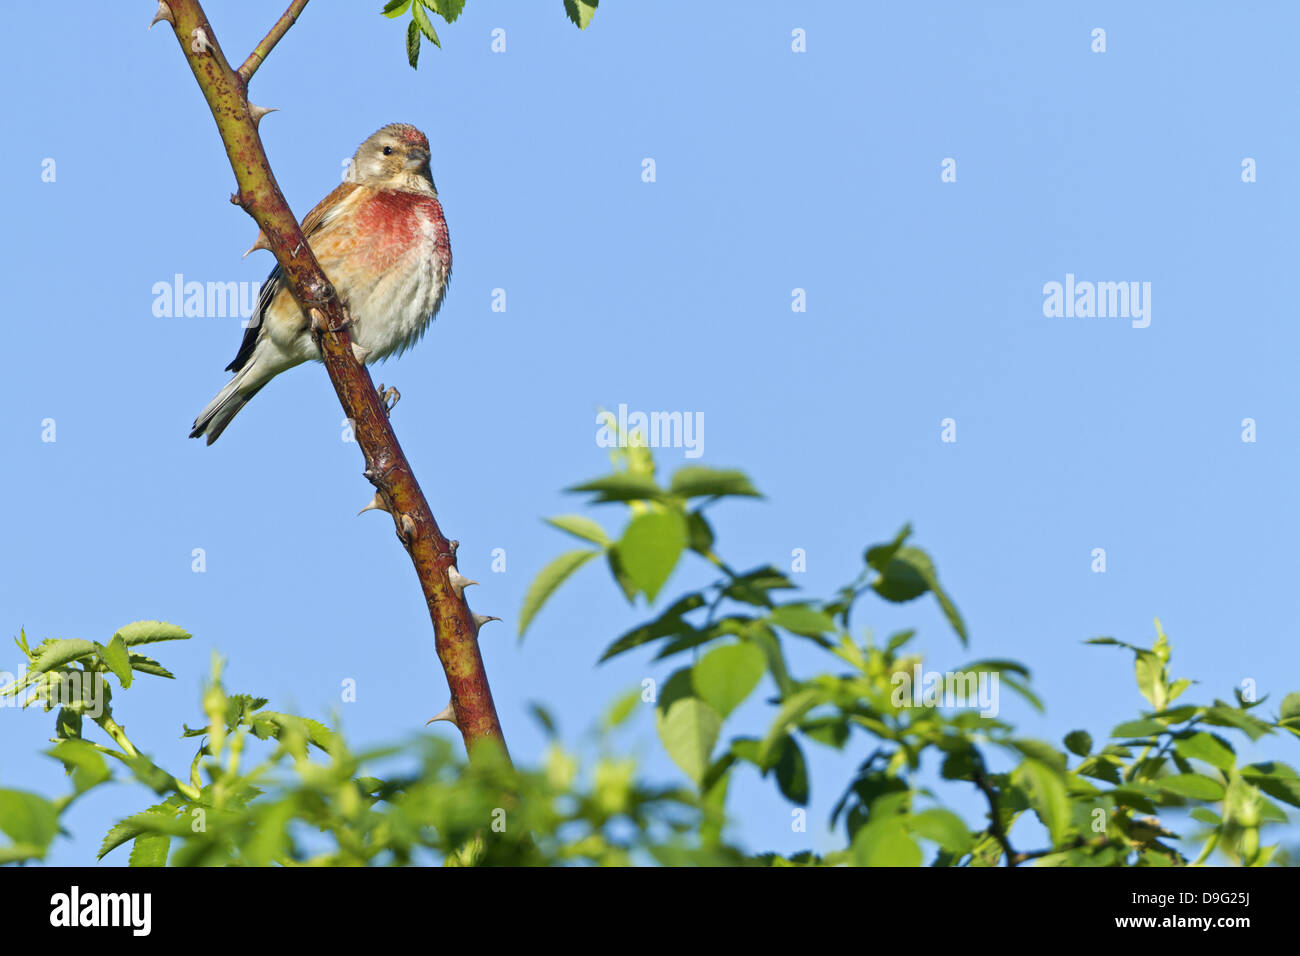 Linnet, Common Linnet, Eurasian Linnet, Carduelis cannabina, Acanthis cannabina, Bluthänfling, Hänfling, - Stock Image